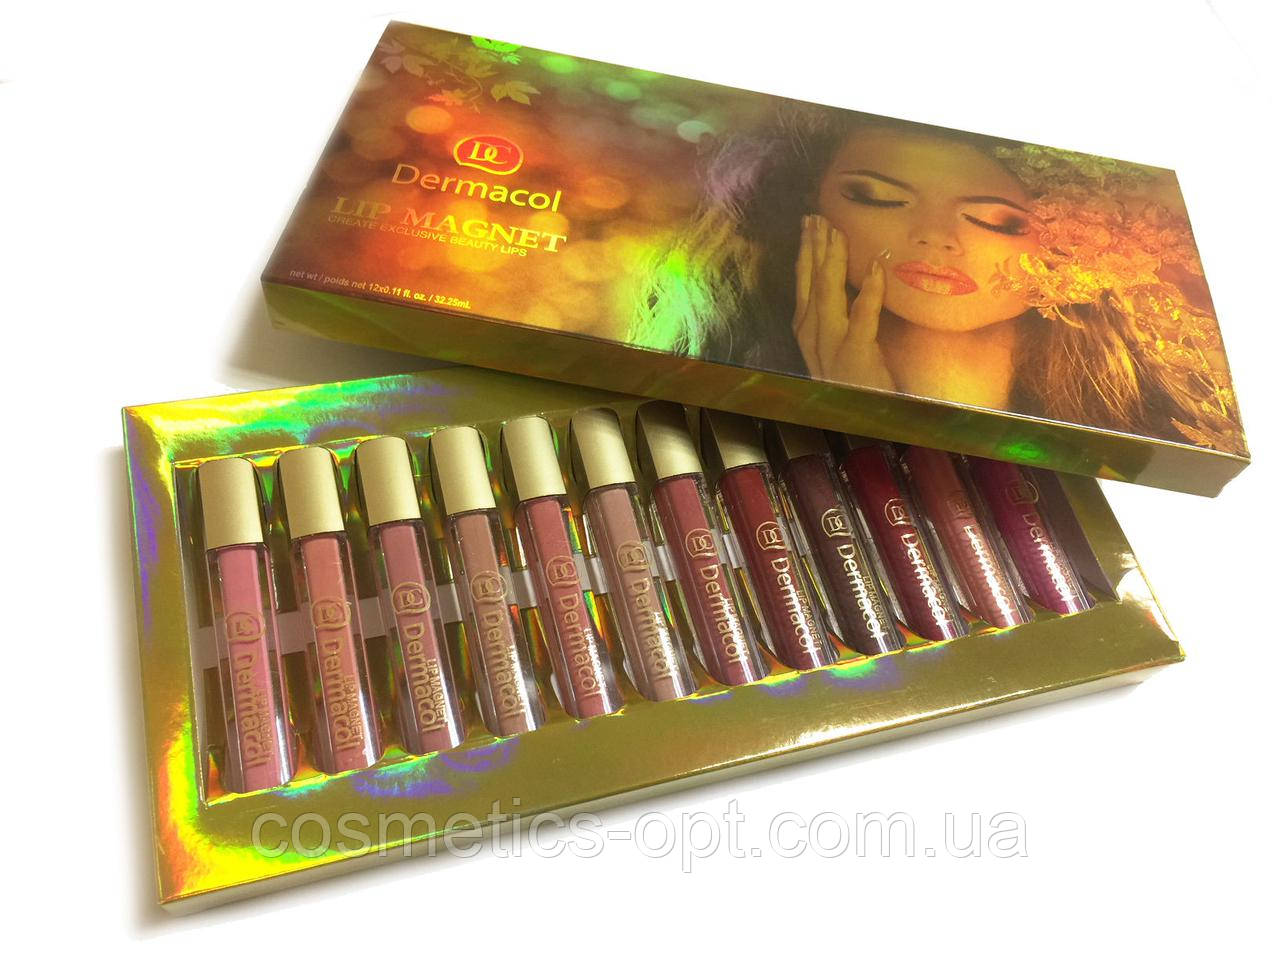 Жидкая матовая помада Dermacol Lip Magnet Create Exclusive Beauty (реплика)